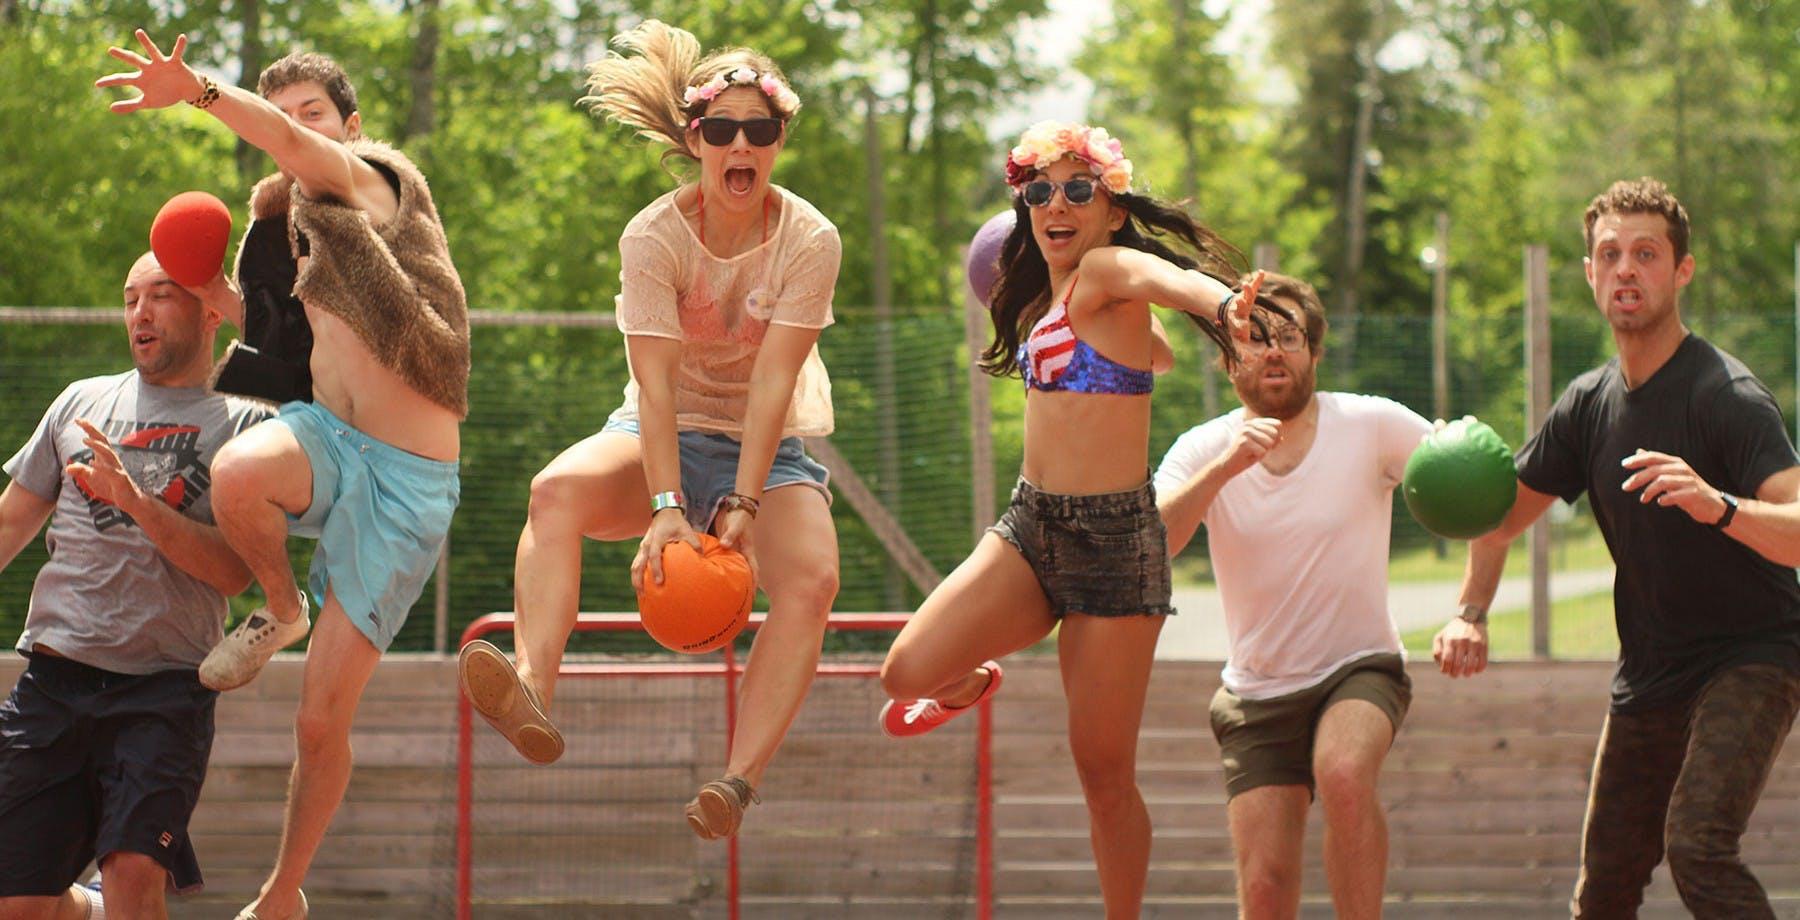 Adult fun summer